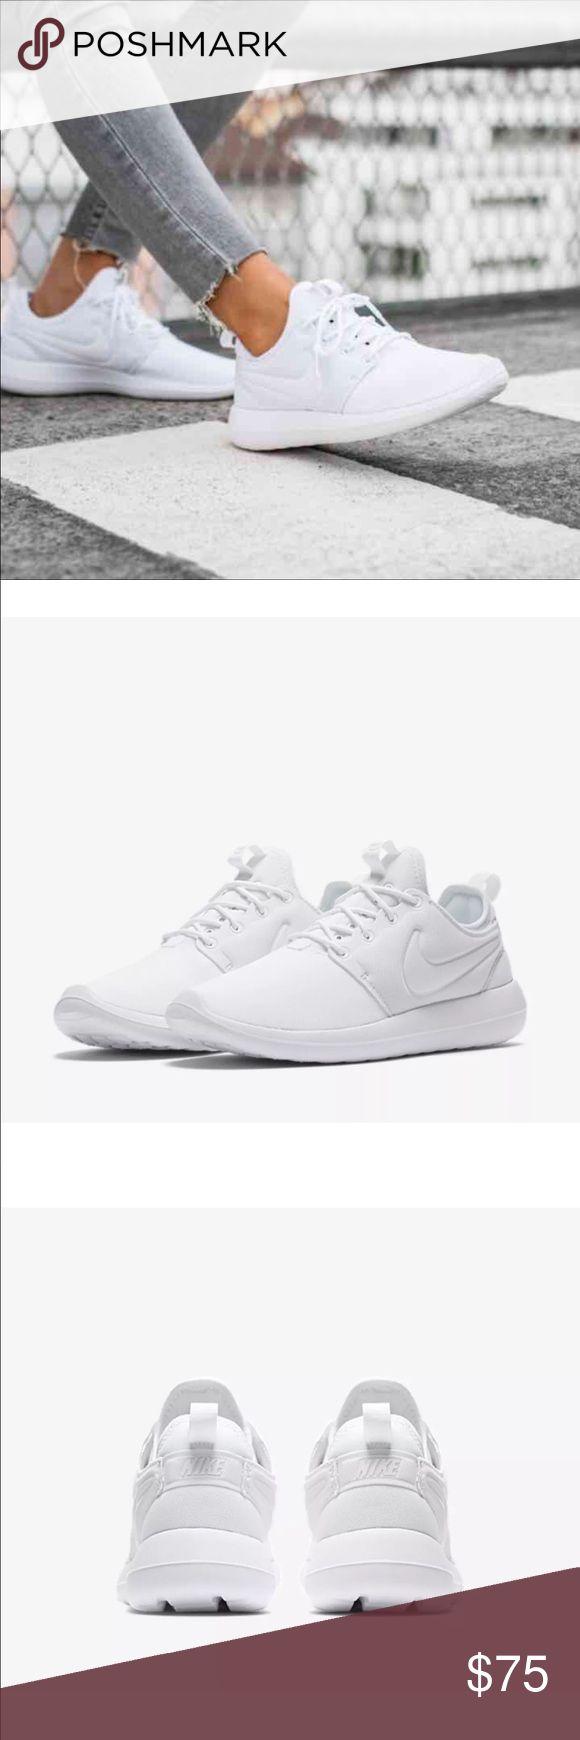 NIKE Roshe 2 White Sneakers Brand new in box Nike Shoes Sneakers